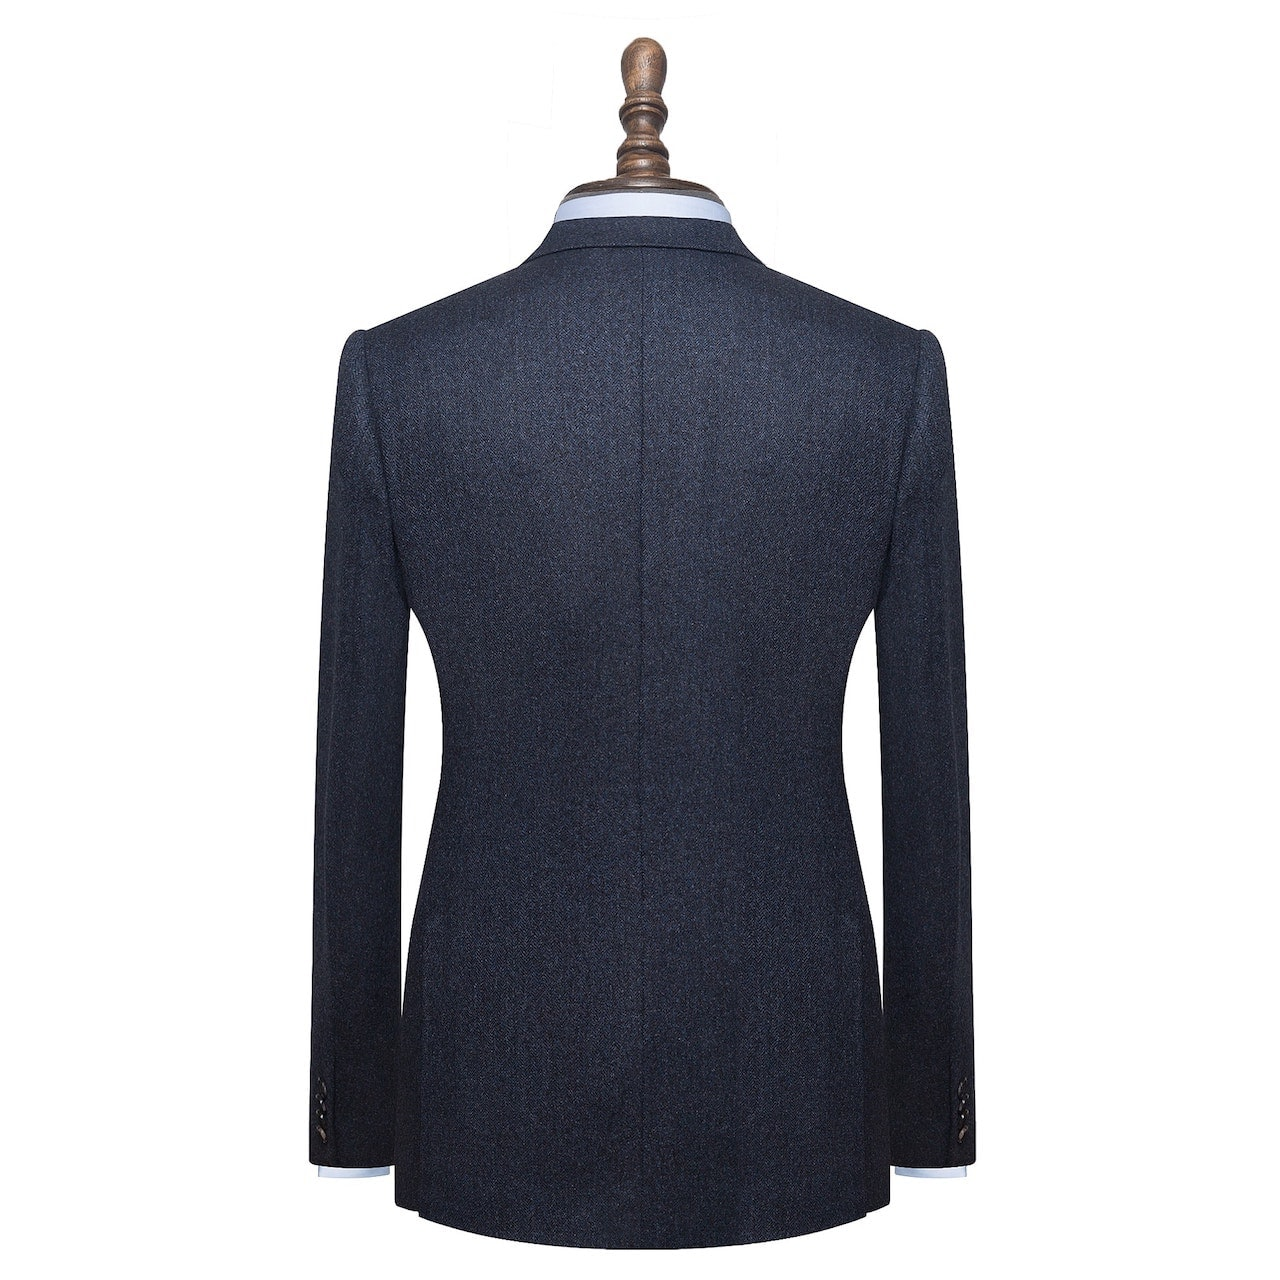 InStitchu Suit Fabric 159